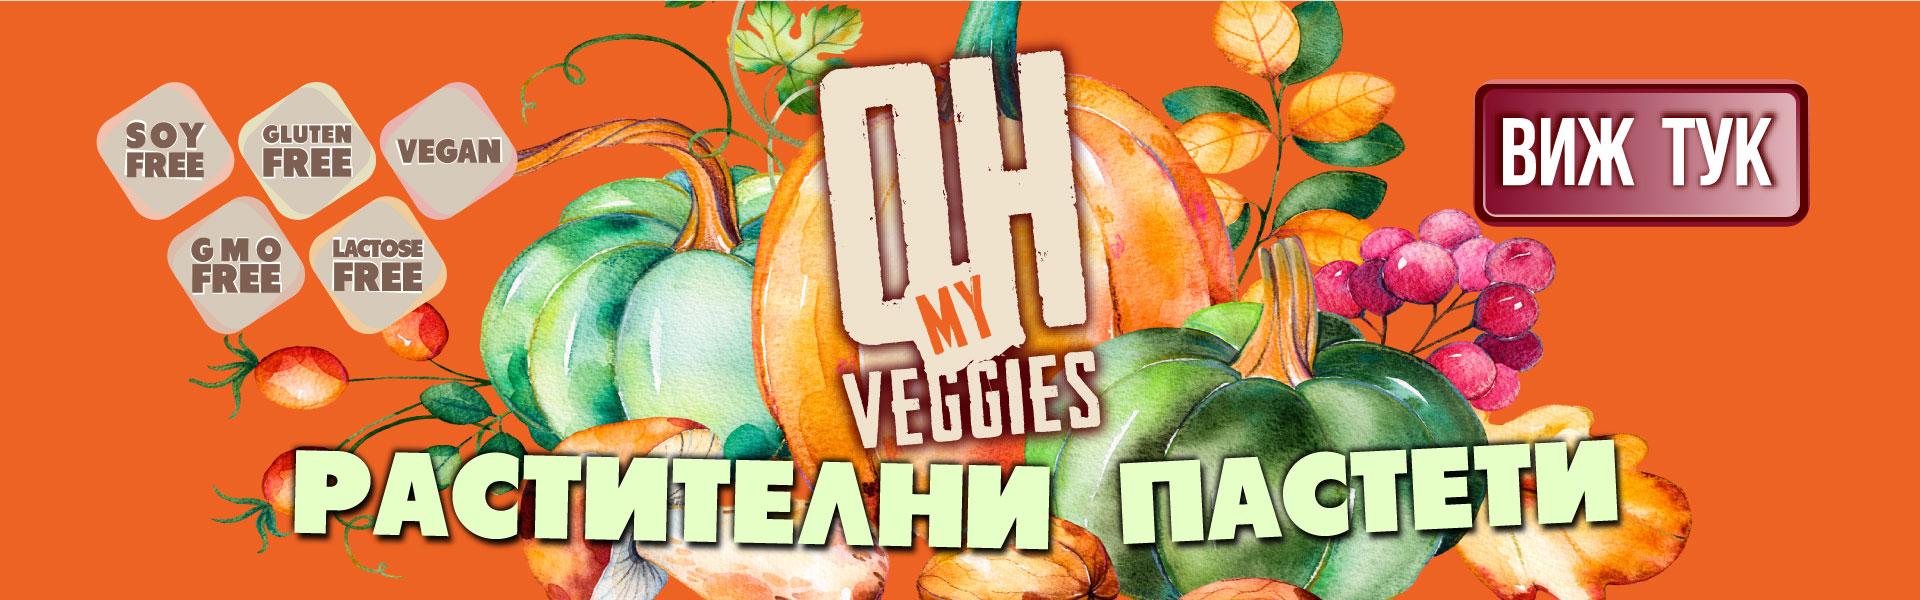 Vegan-pasteti-Oh-my-veggies-kompyutar